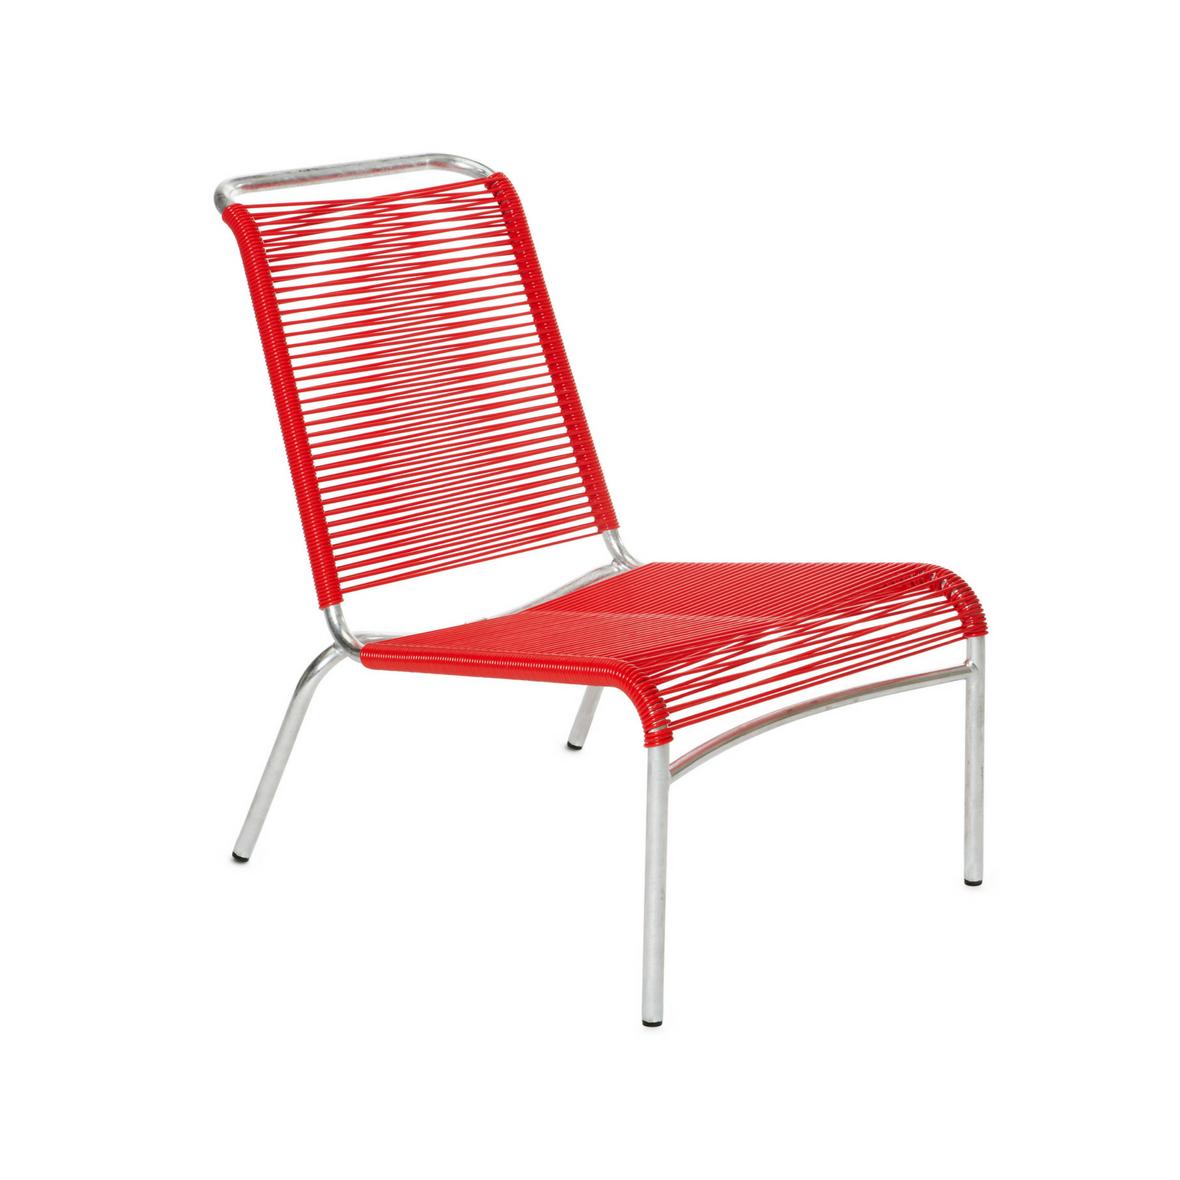 Altorfer Lounge Stuhl 1139 Verkehrsrot von Embru